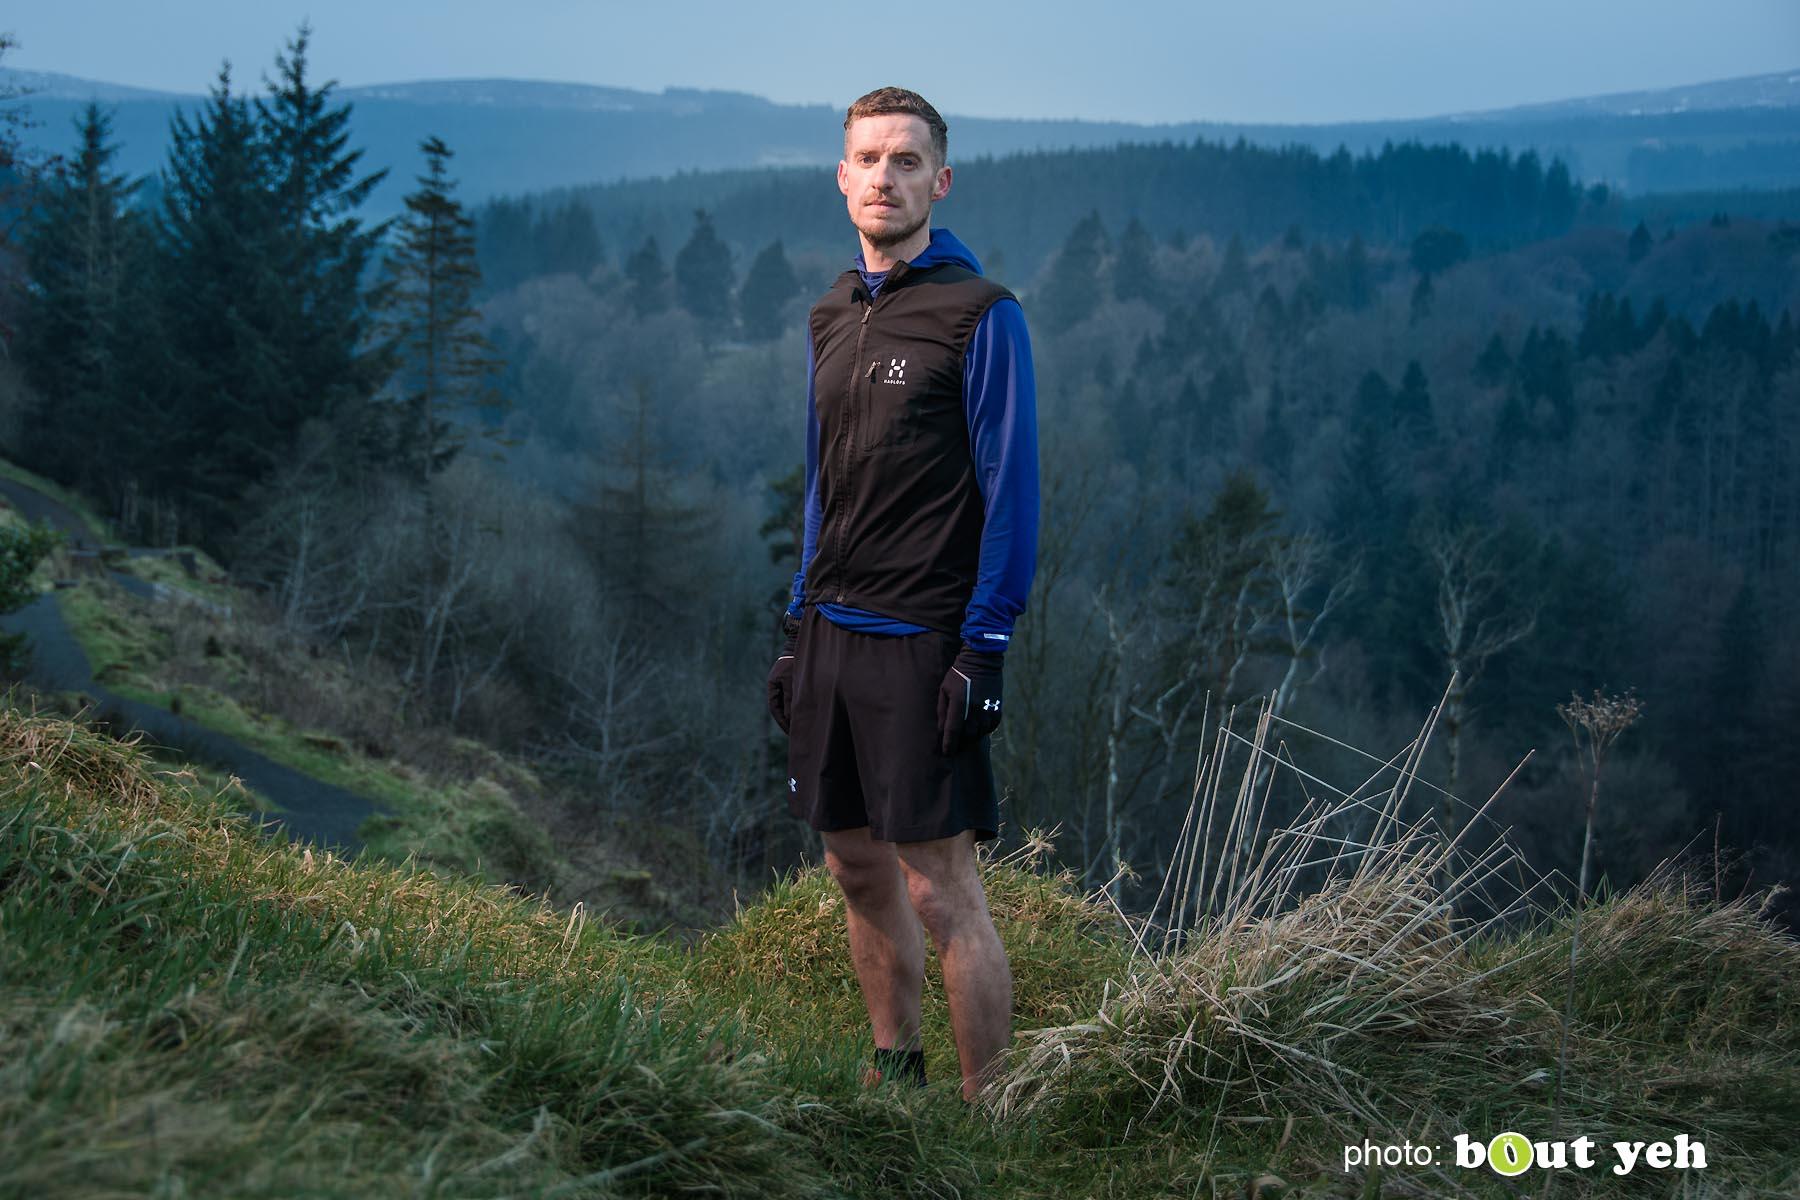 Tim, of Ballymena Runners, at Glenariff Forest, Northern Ireland - photo 0610.